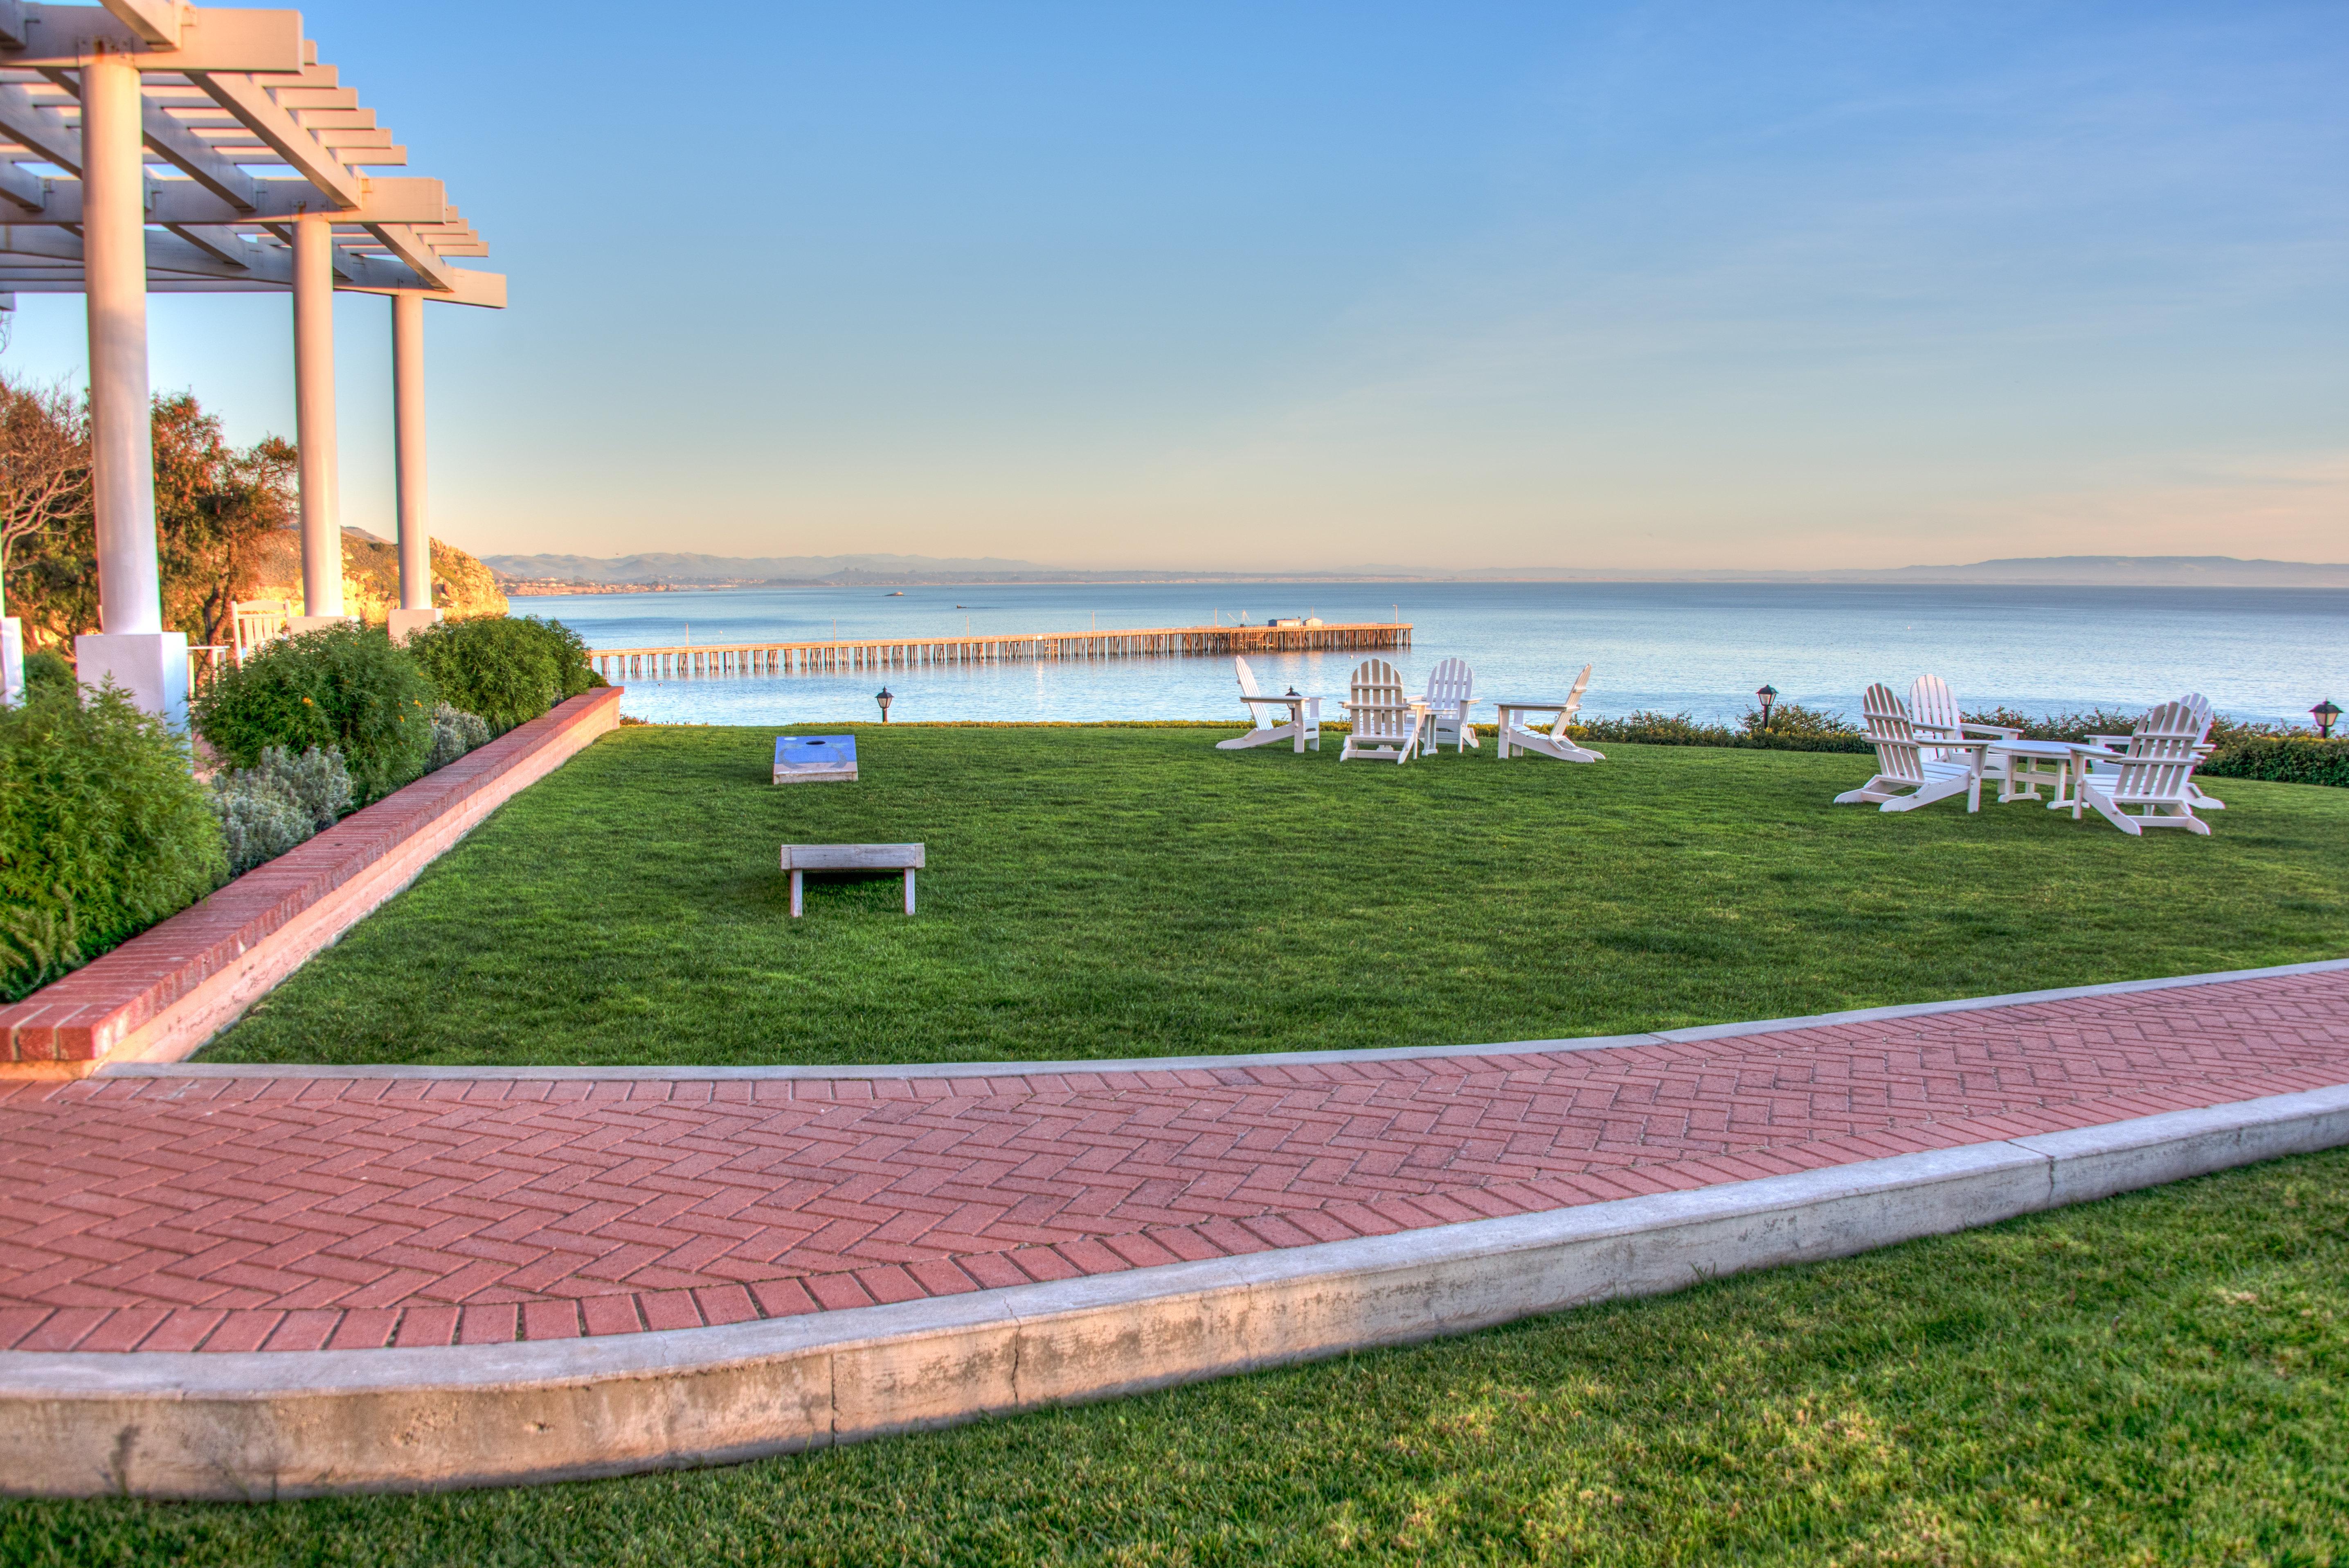 San Luis Bay Inn Avila Beach Ca Hotels Gds Reservation Codes Travel Weekly